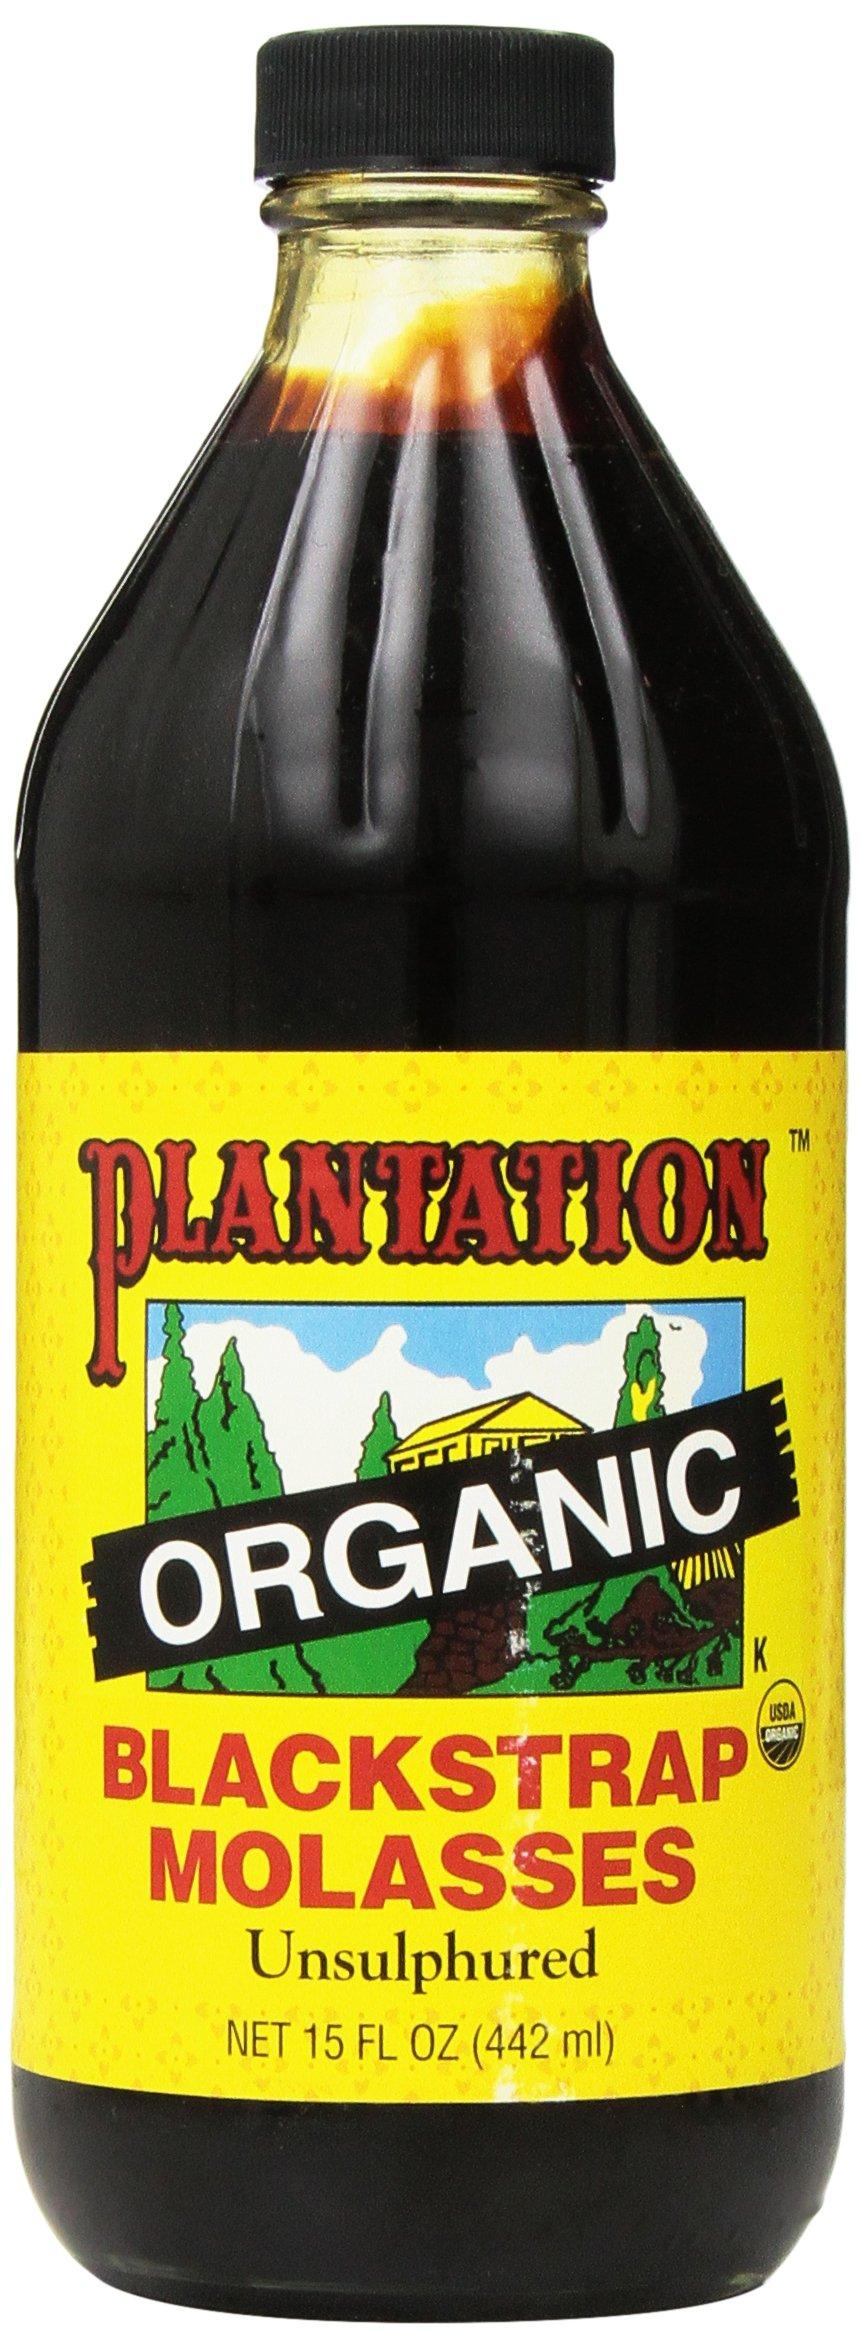 Molasses, Blackstrap, Unsulfured, Organic, 15 oz.